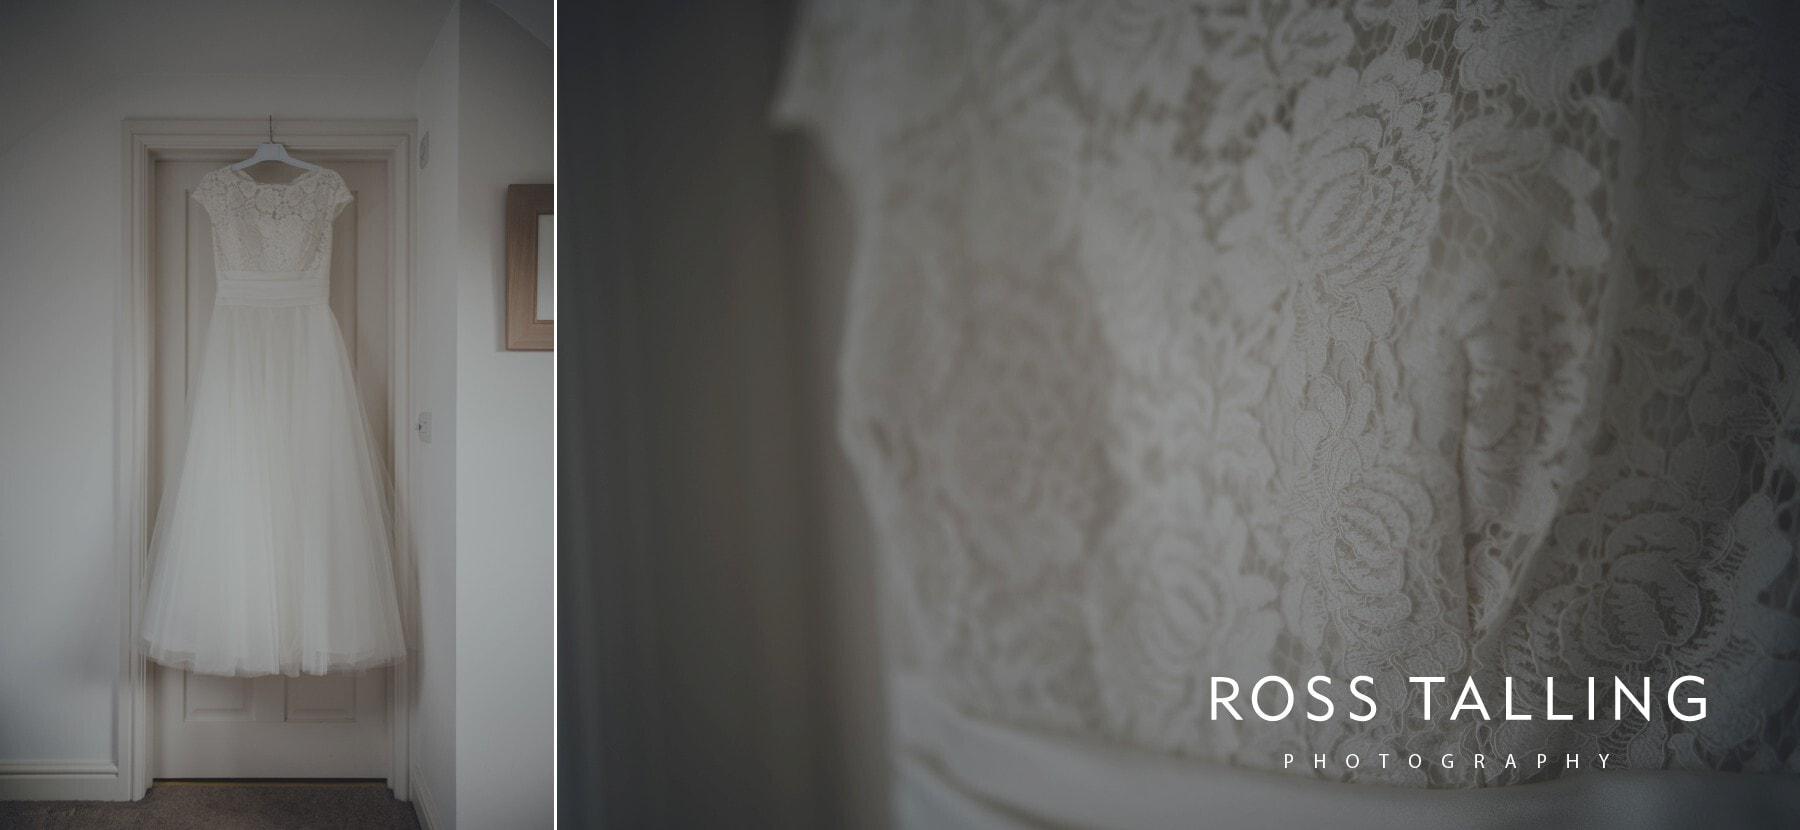 laura-matts-rosevine-hotel-wedding-photography-cornwall_0011